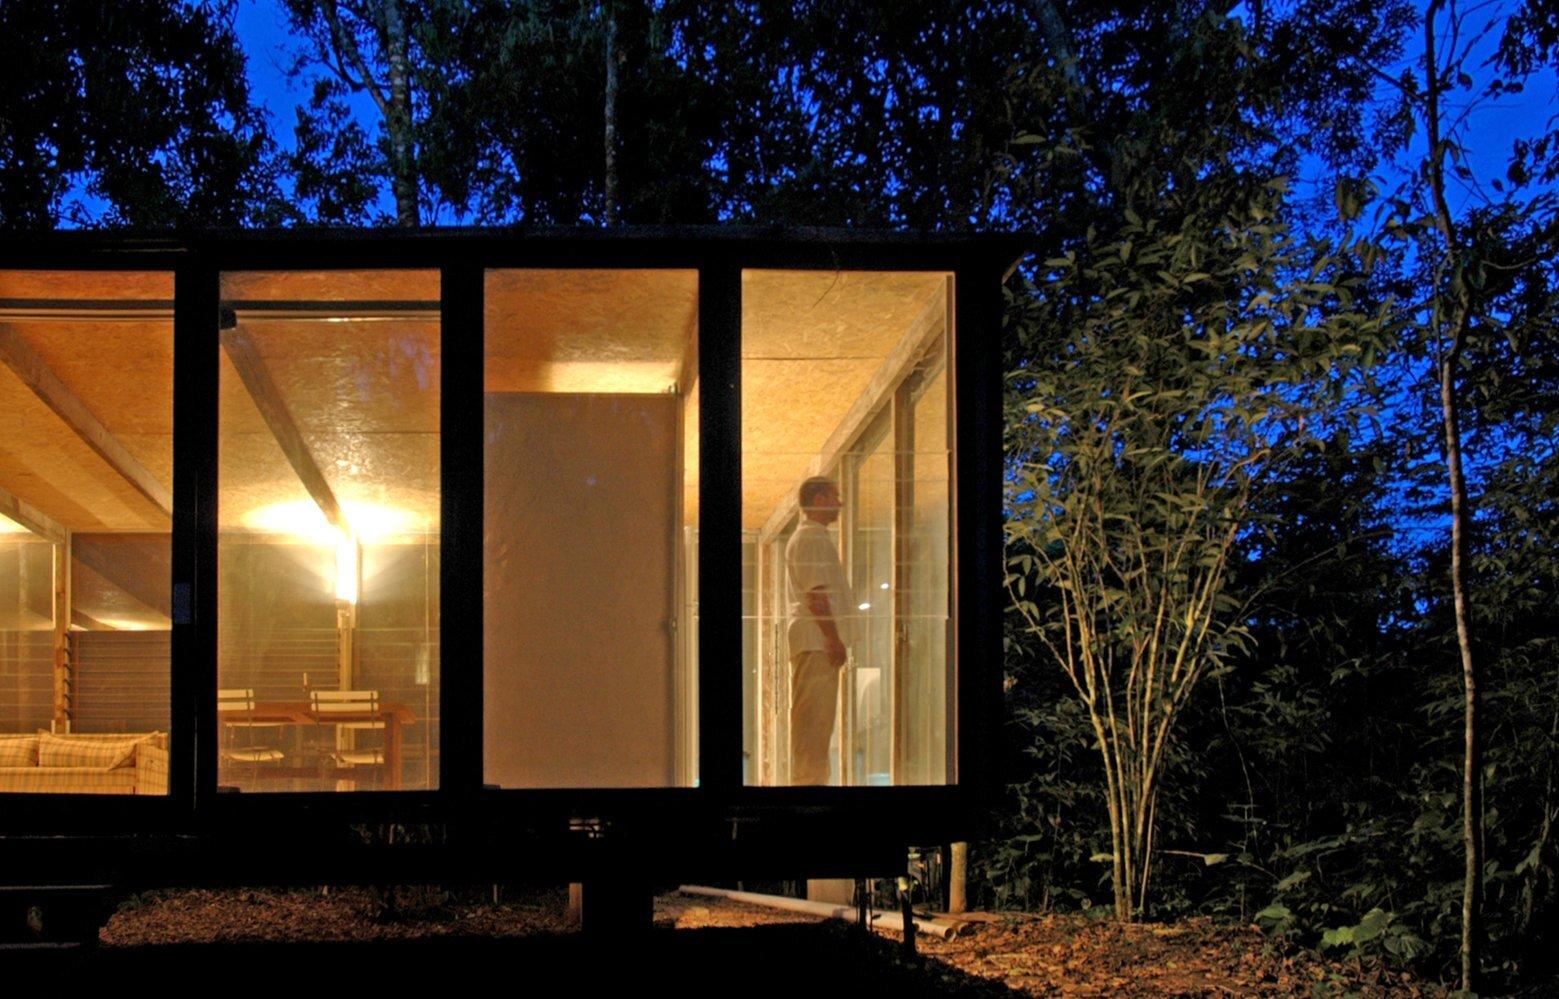 Casa na Mata - NITSCHE ARQUITETOS - Brazil - Small House - Exterior Night - Humble Homes